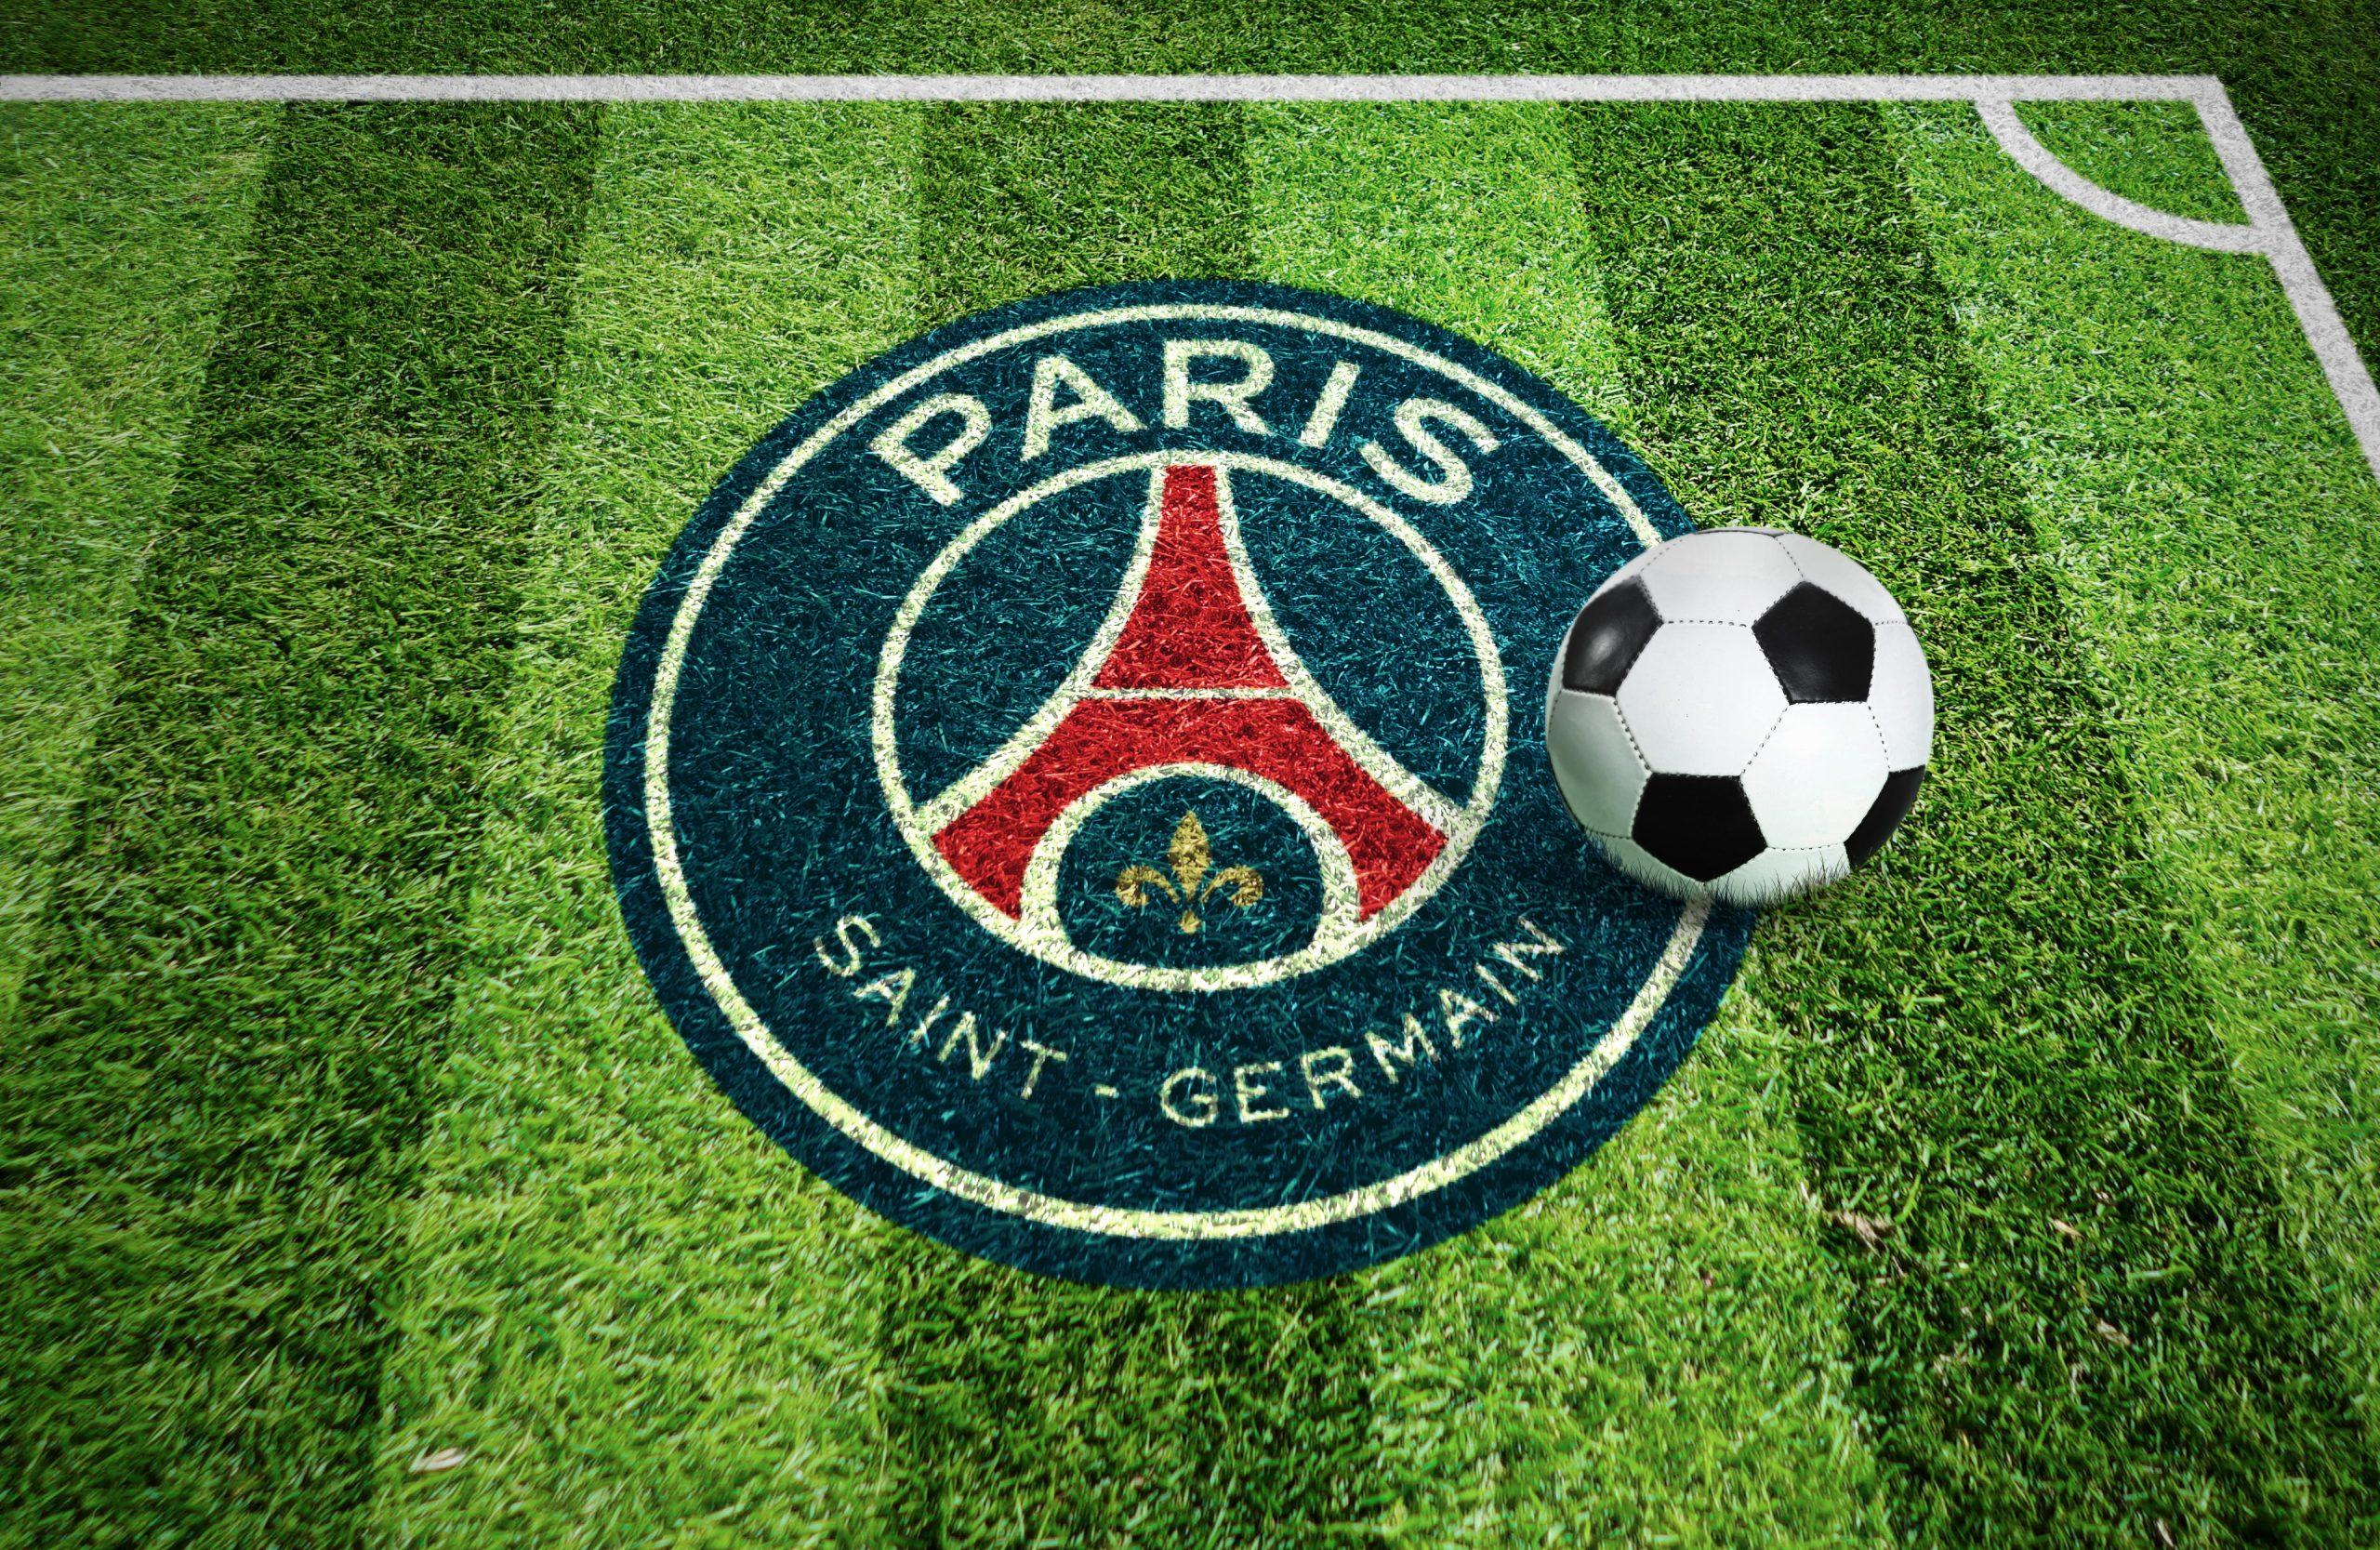 Saint Germain Stadium Grass Ground Logo Mockup